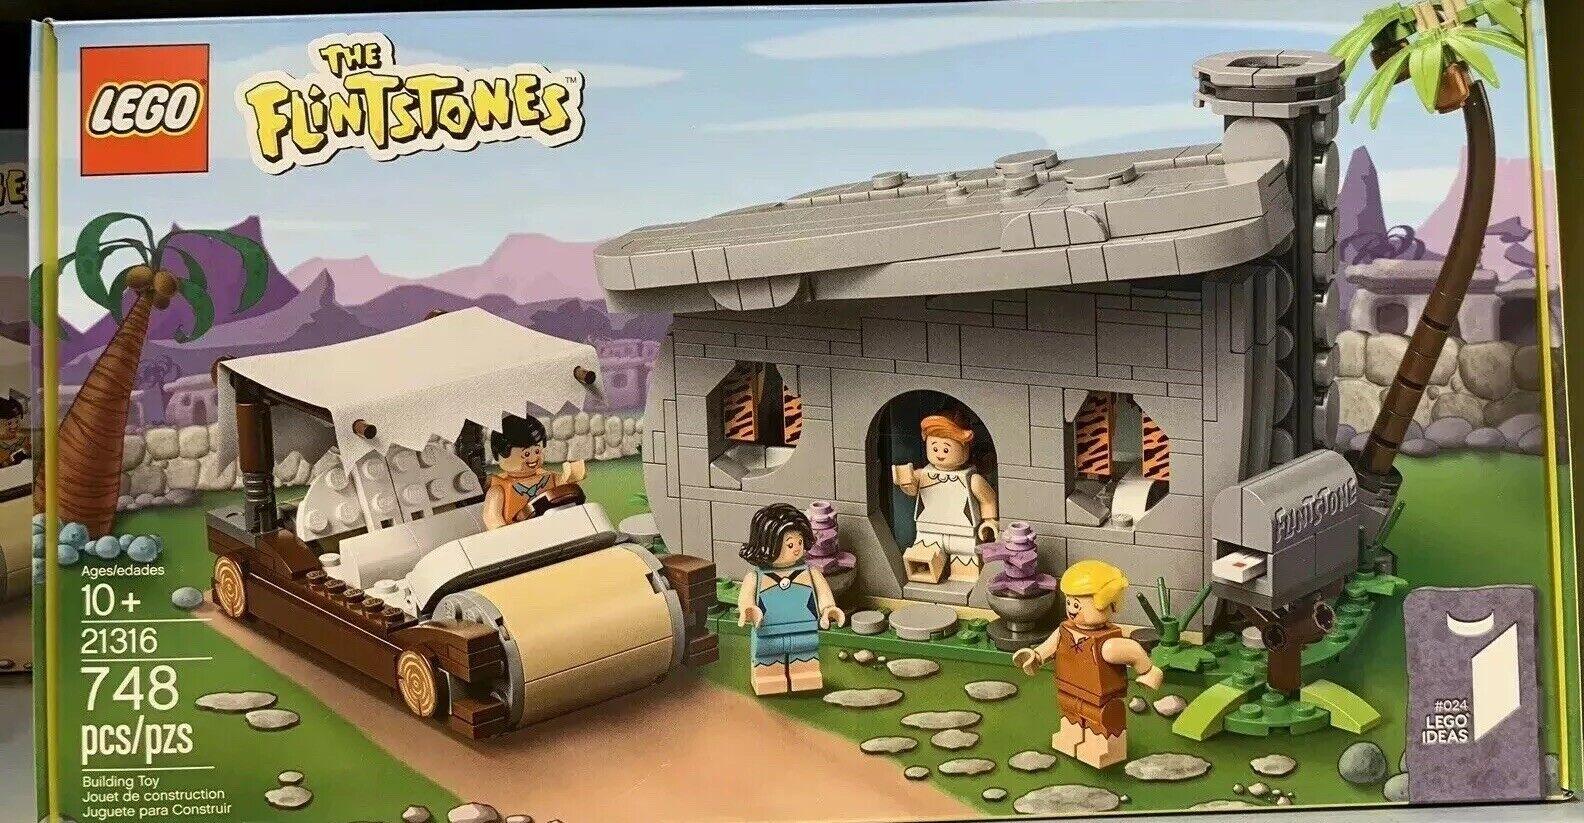 LEGO 21316 The Flinstones Ideas pcs New in Hand Free Free Free Shipping 78268b